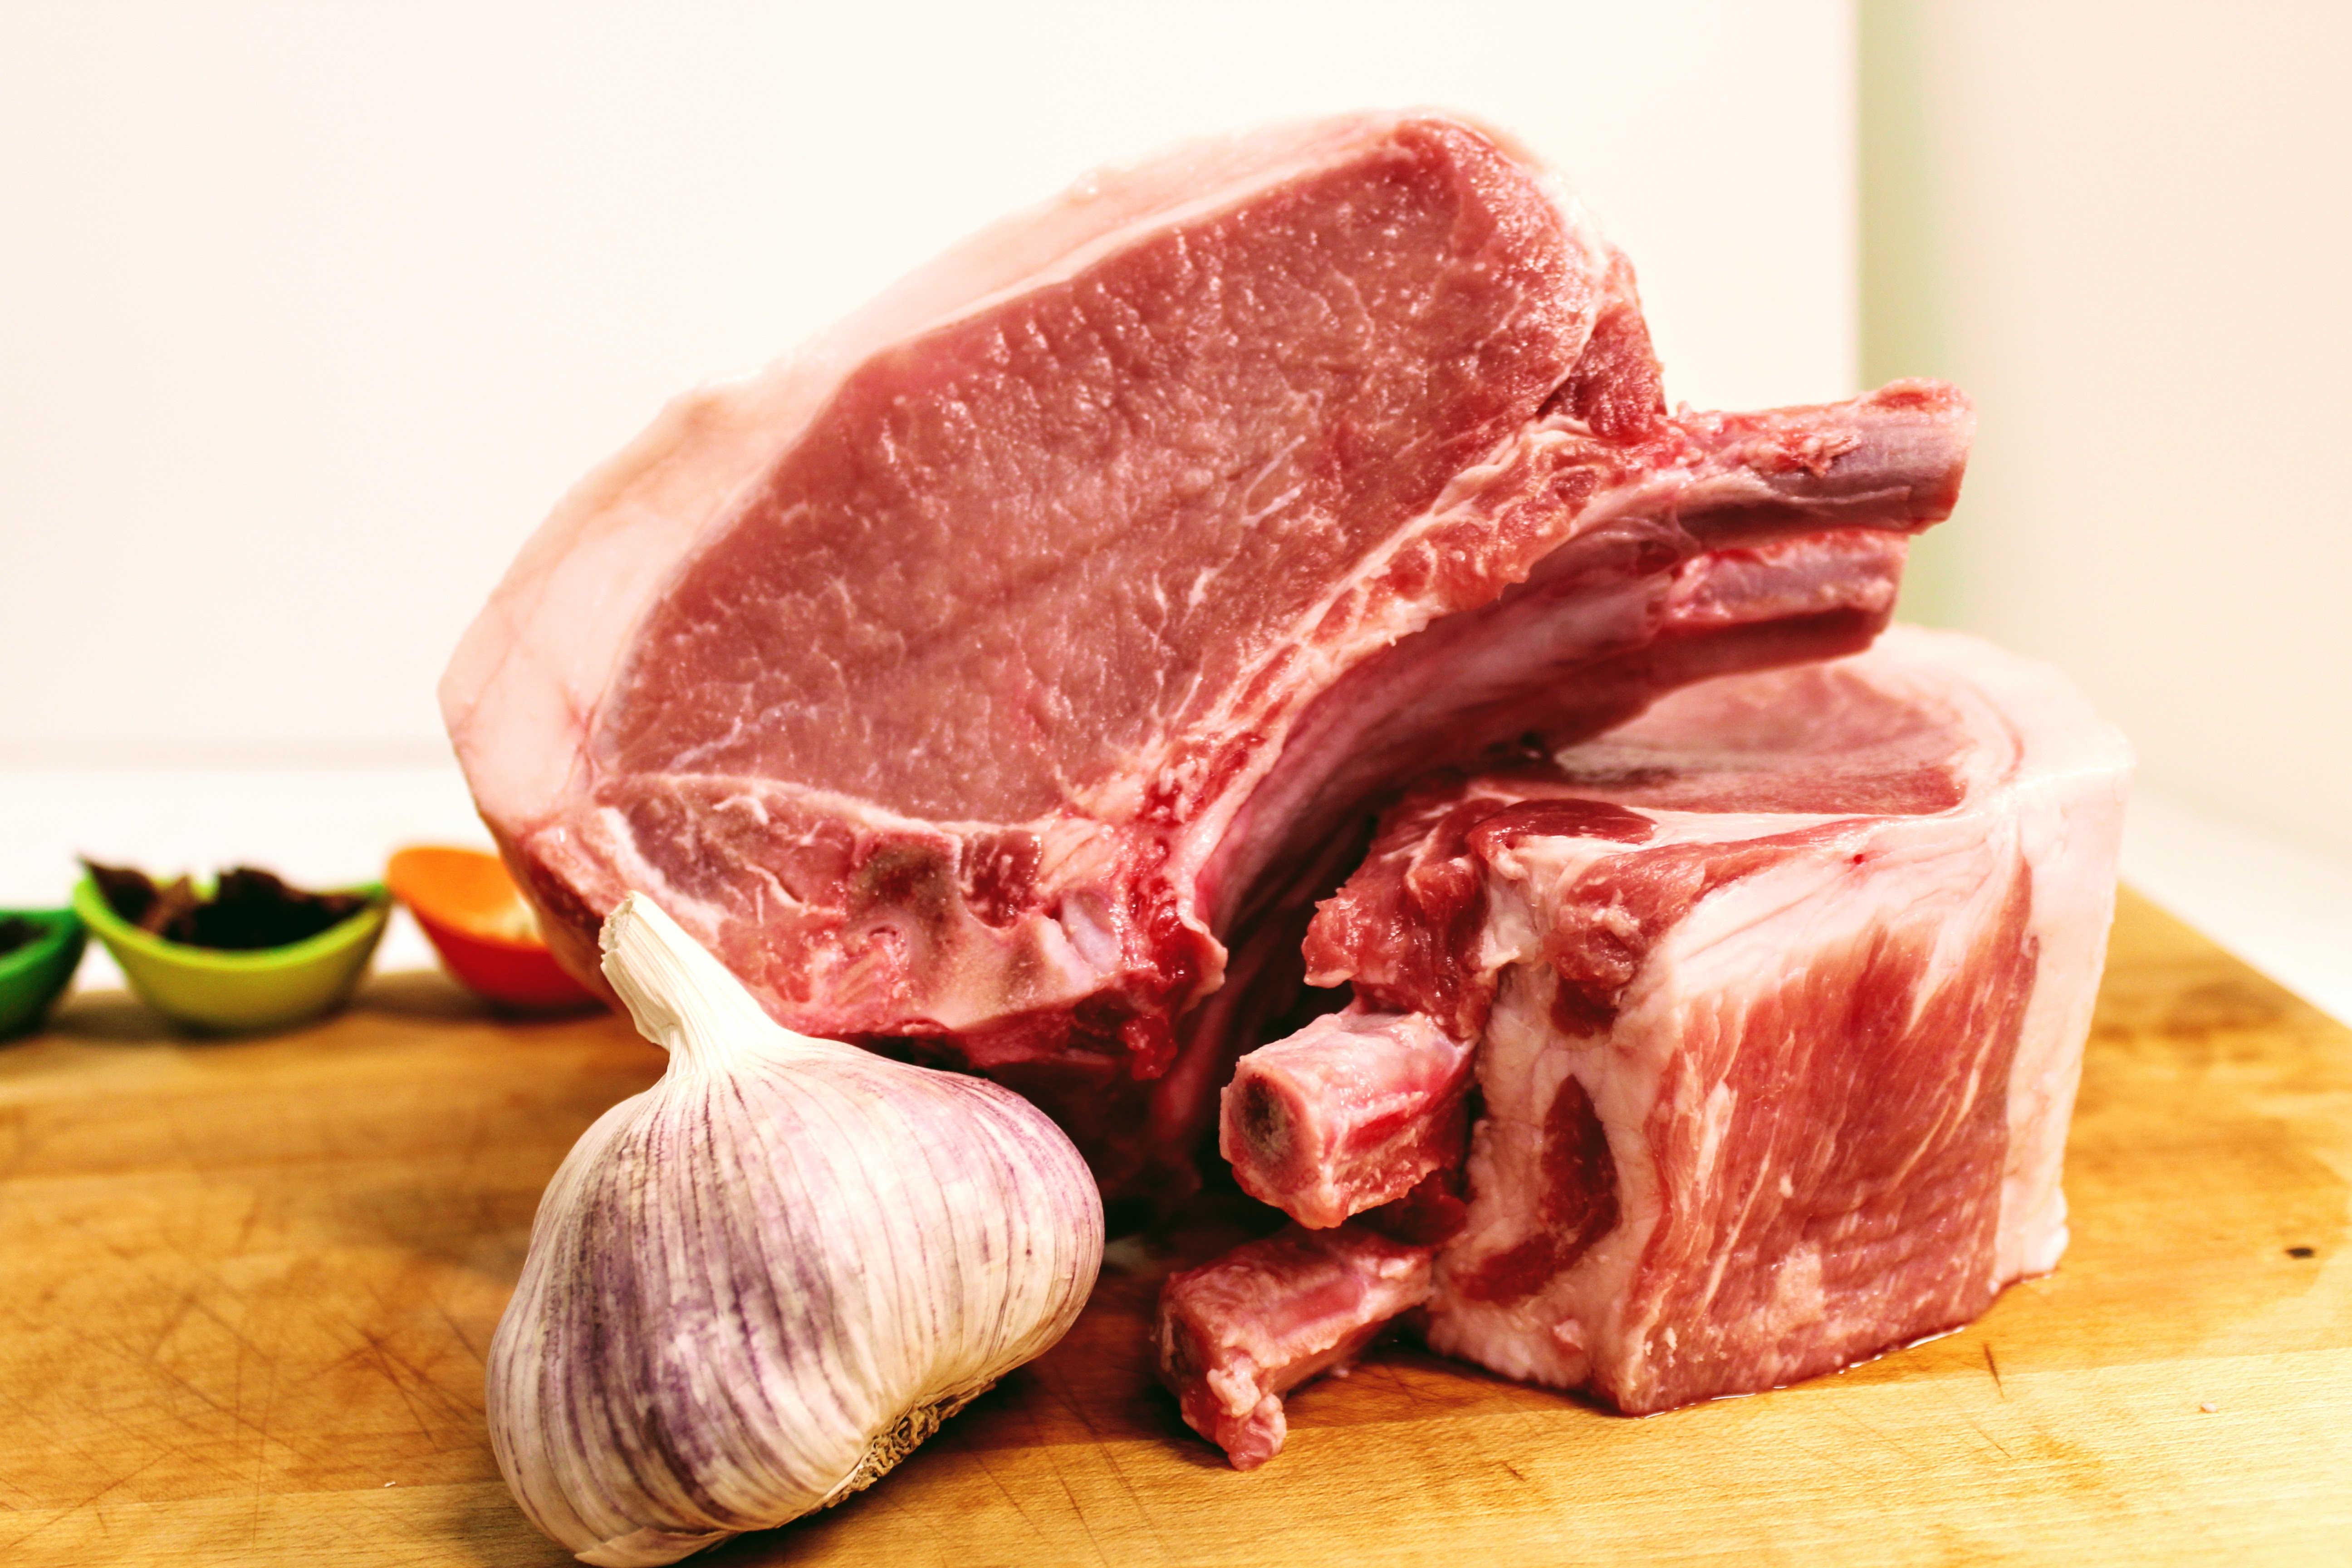 Pork - Double Rib Chop - Bone-in